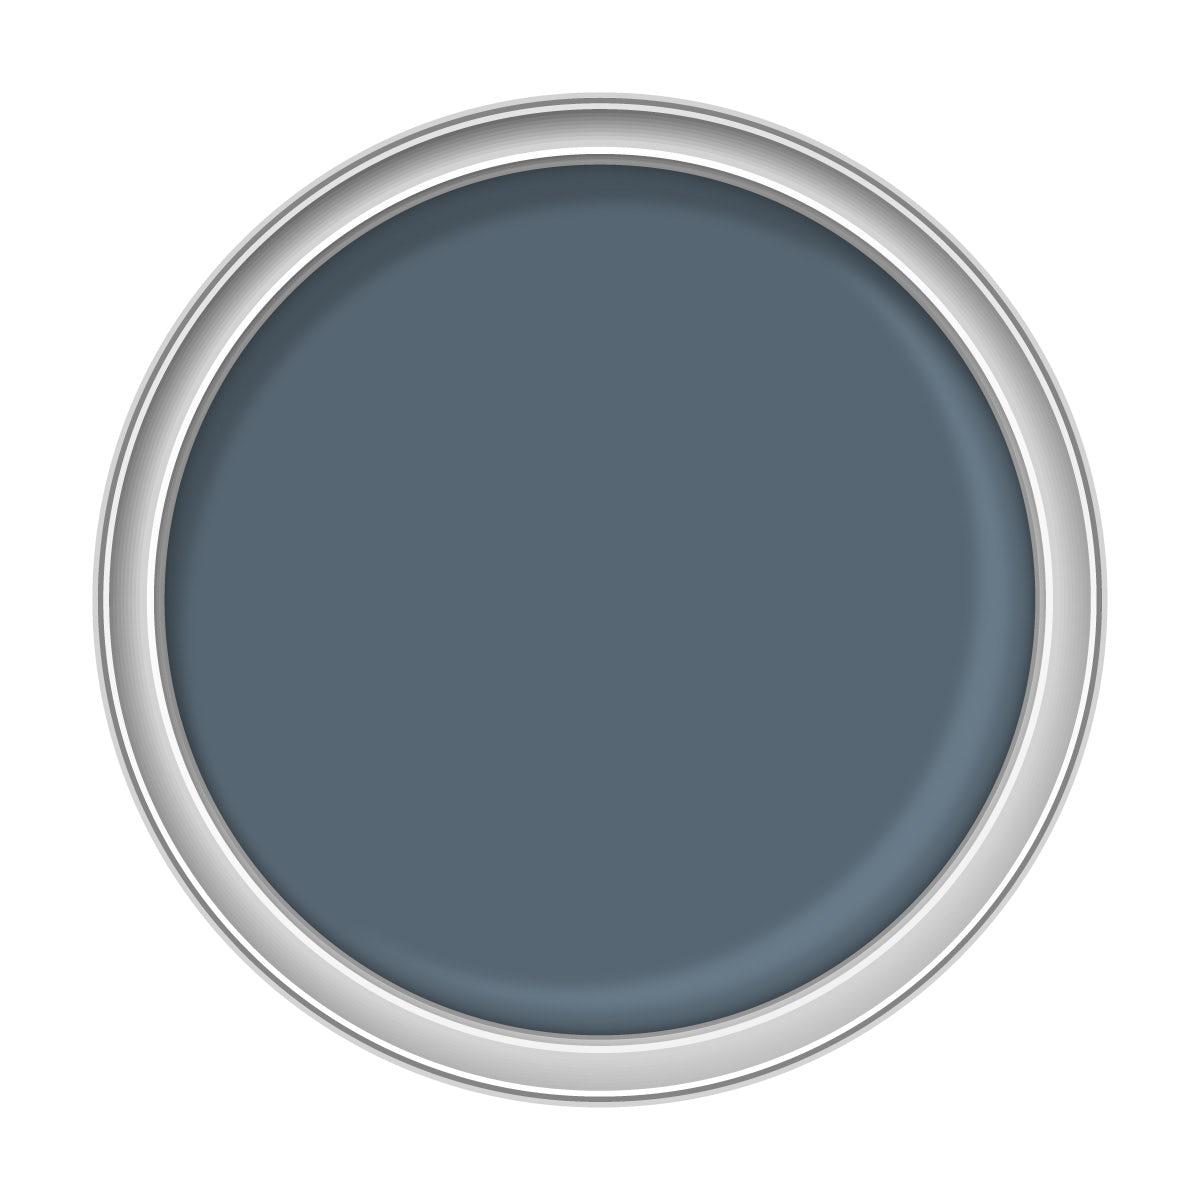 Craig & Rose midnight blue kitchen & bathroom paint 2.5L